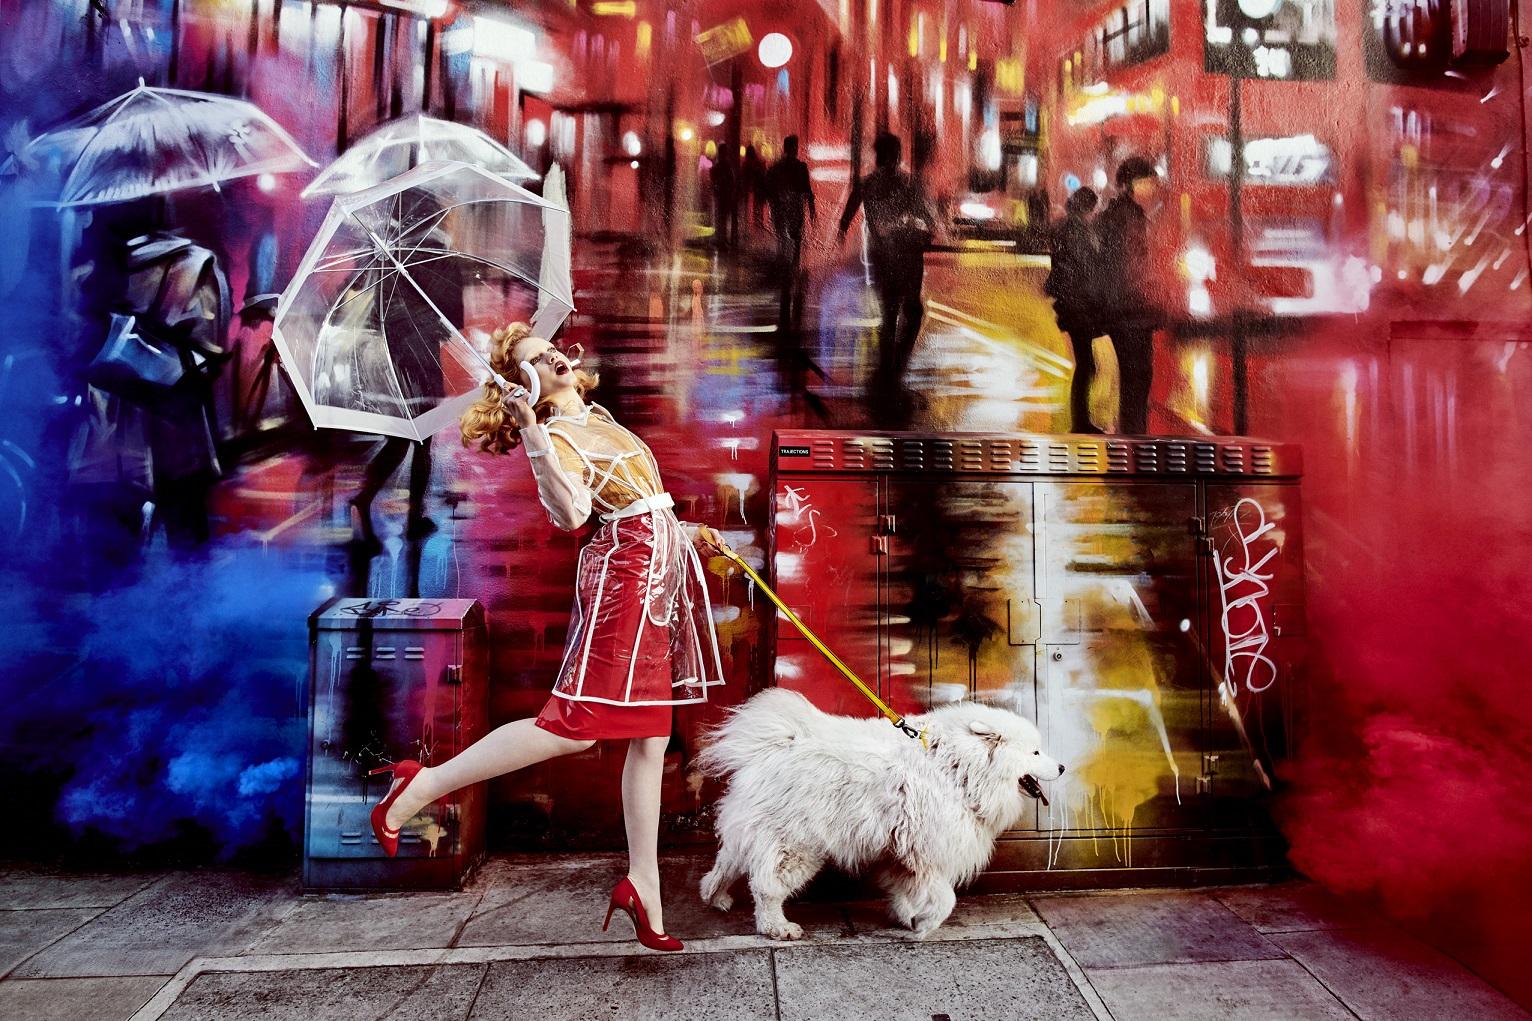 NIKON: la D850 coglie l'incontro tra la moda e i graffiti londinesi thumbnail